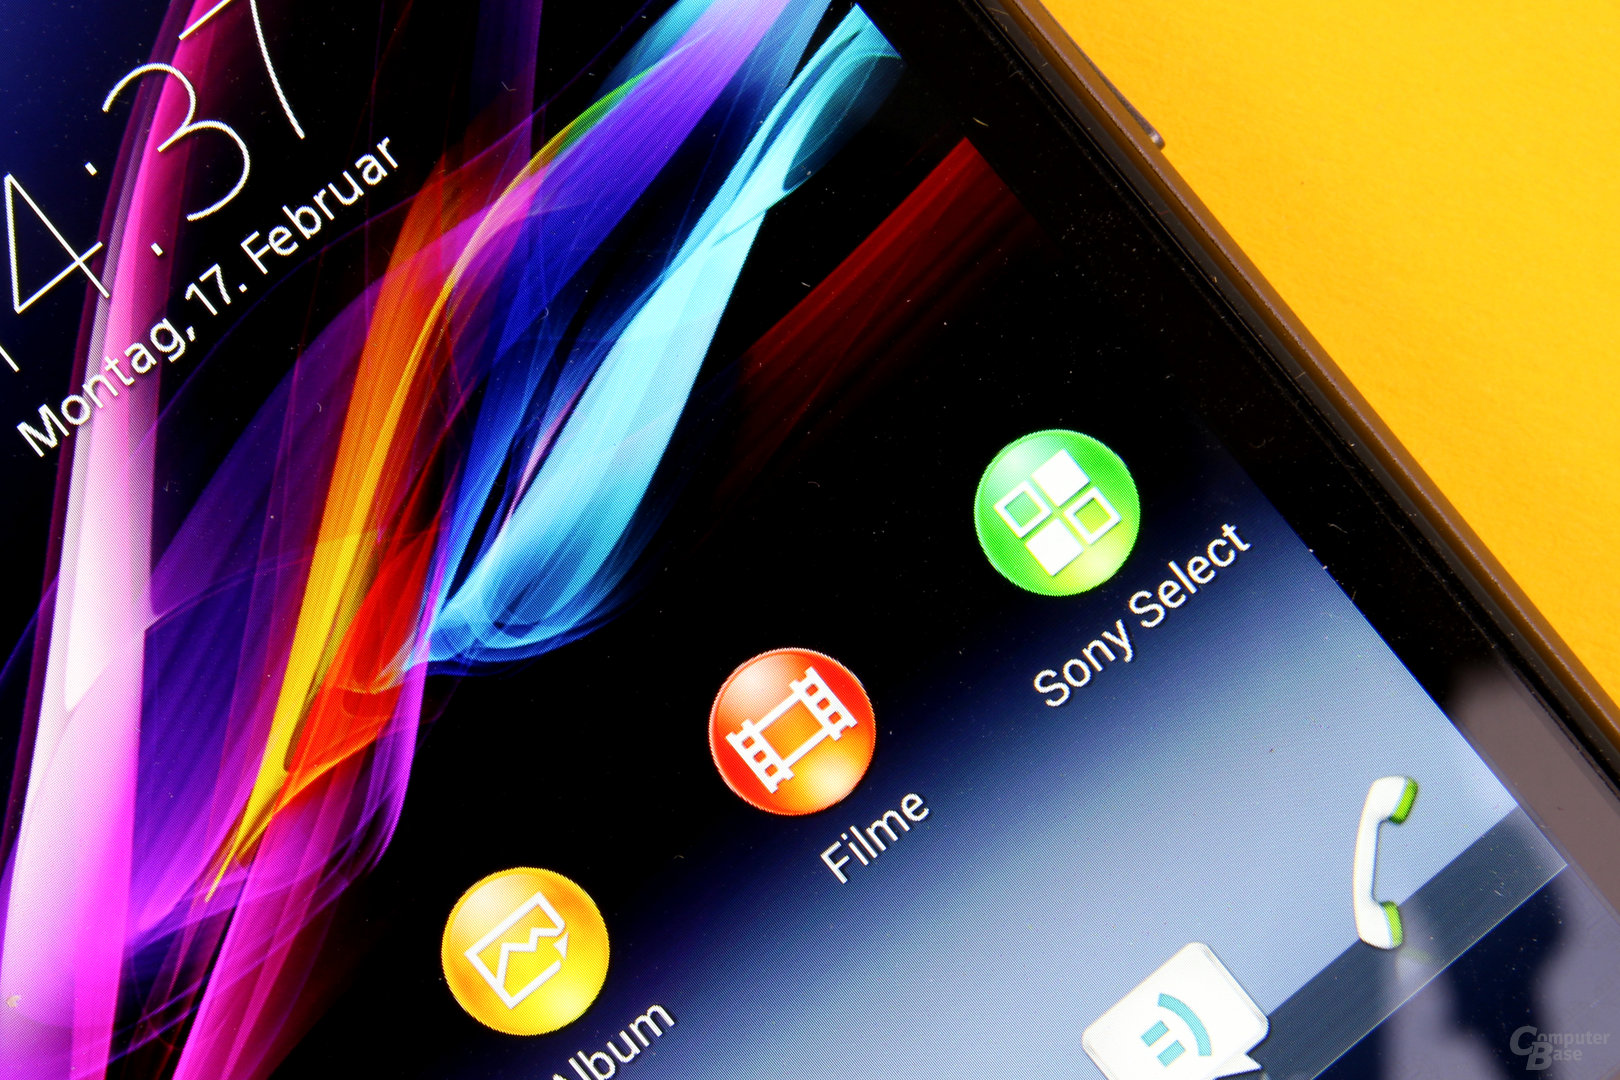 Sony Xperia Z1 Compact – Helles Display mit hoher Pixeldichte